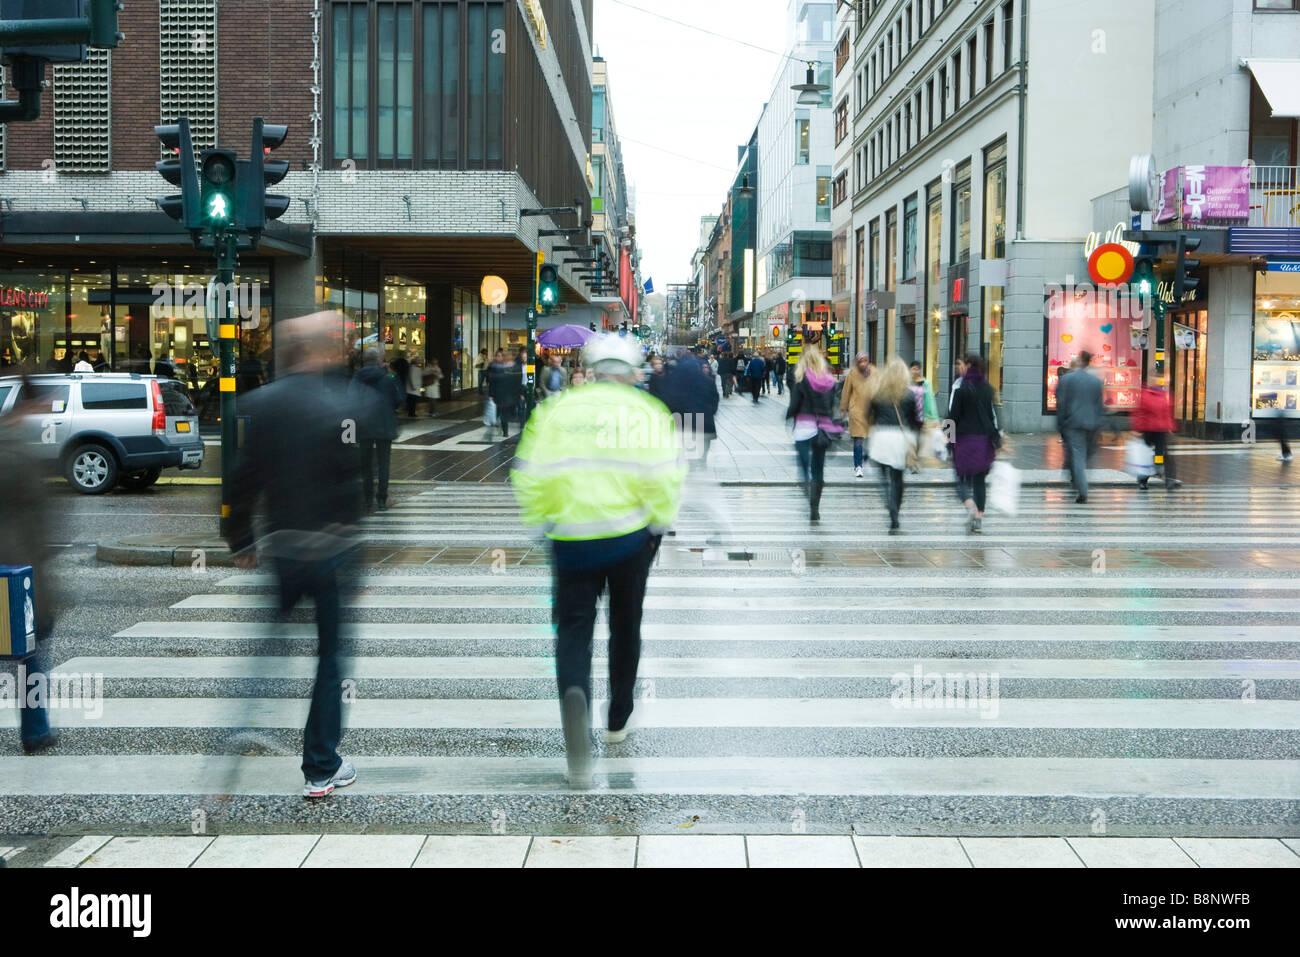 Sweden, Stockholm, pedestrians crossing street - Stock Image